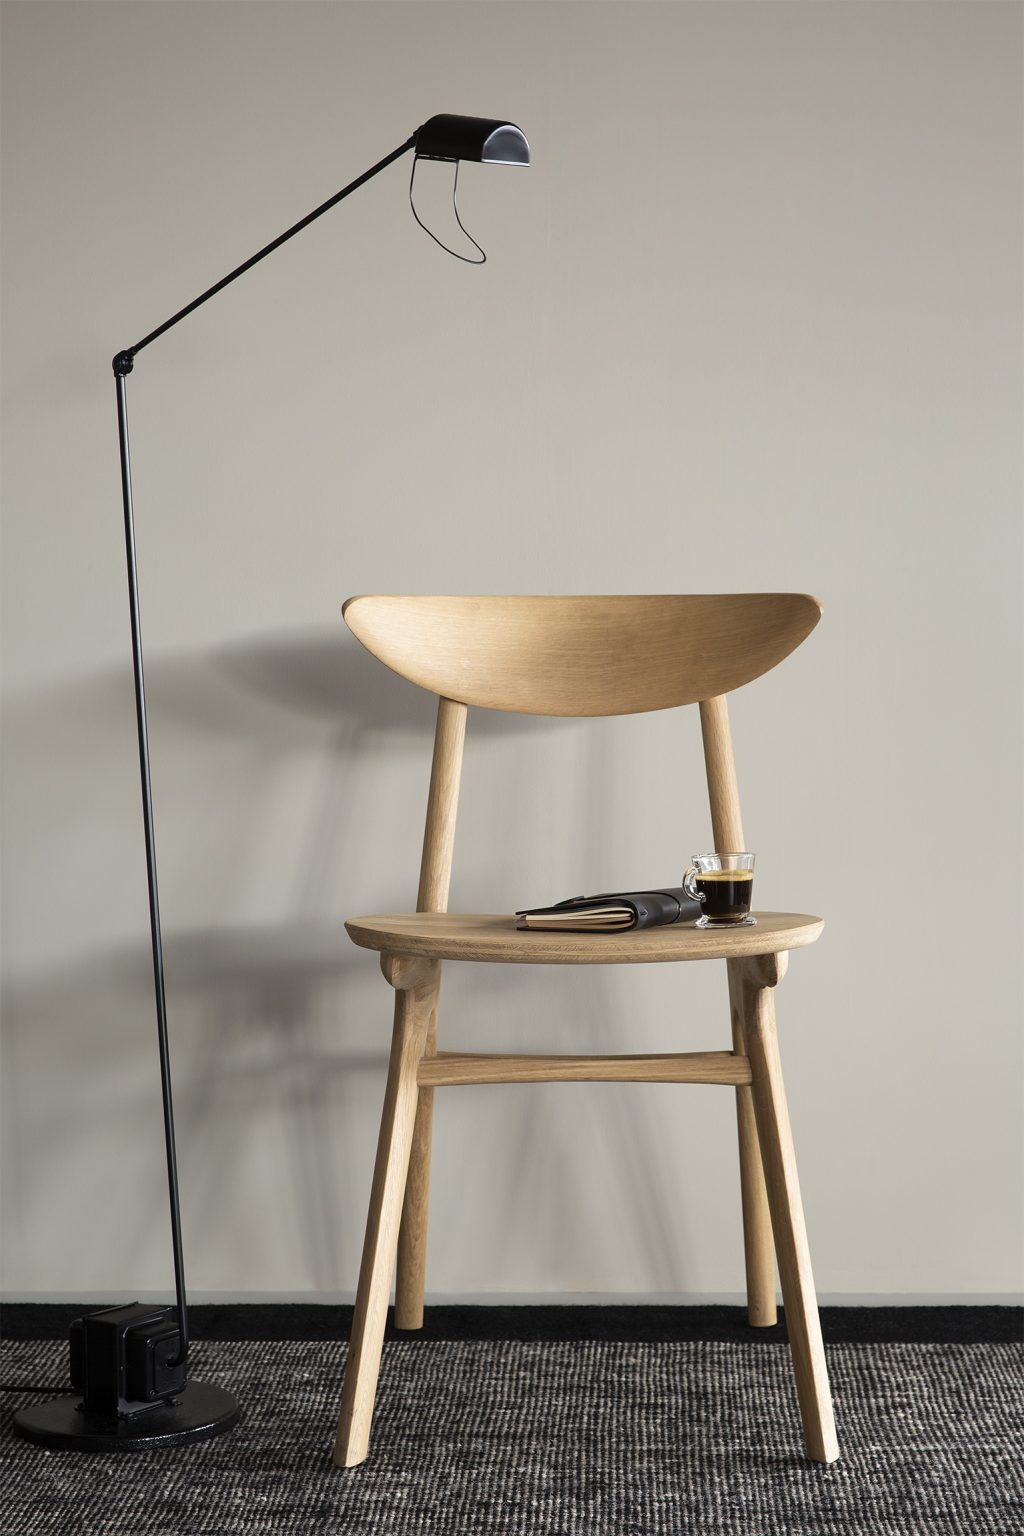 Biennale Interieur - Belgium's leading design and interior event - Oak_eye_dining_chair_3_web.jpg